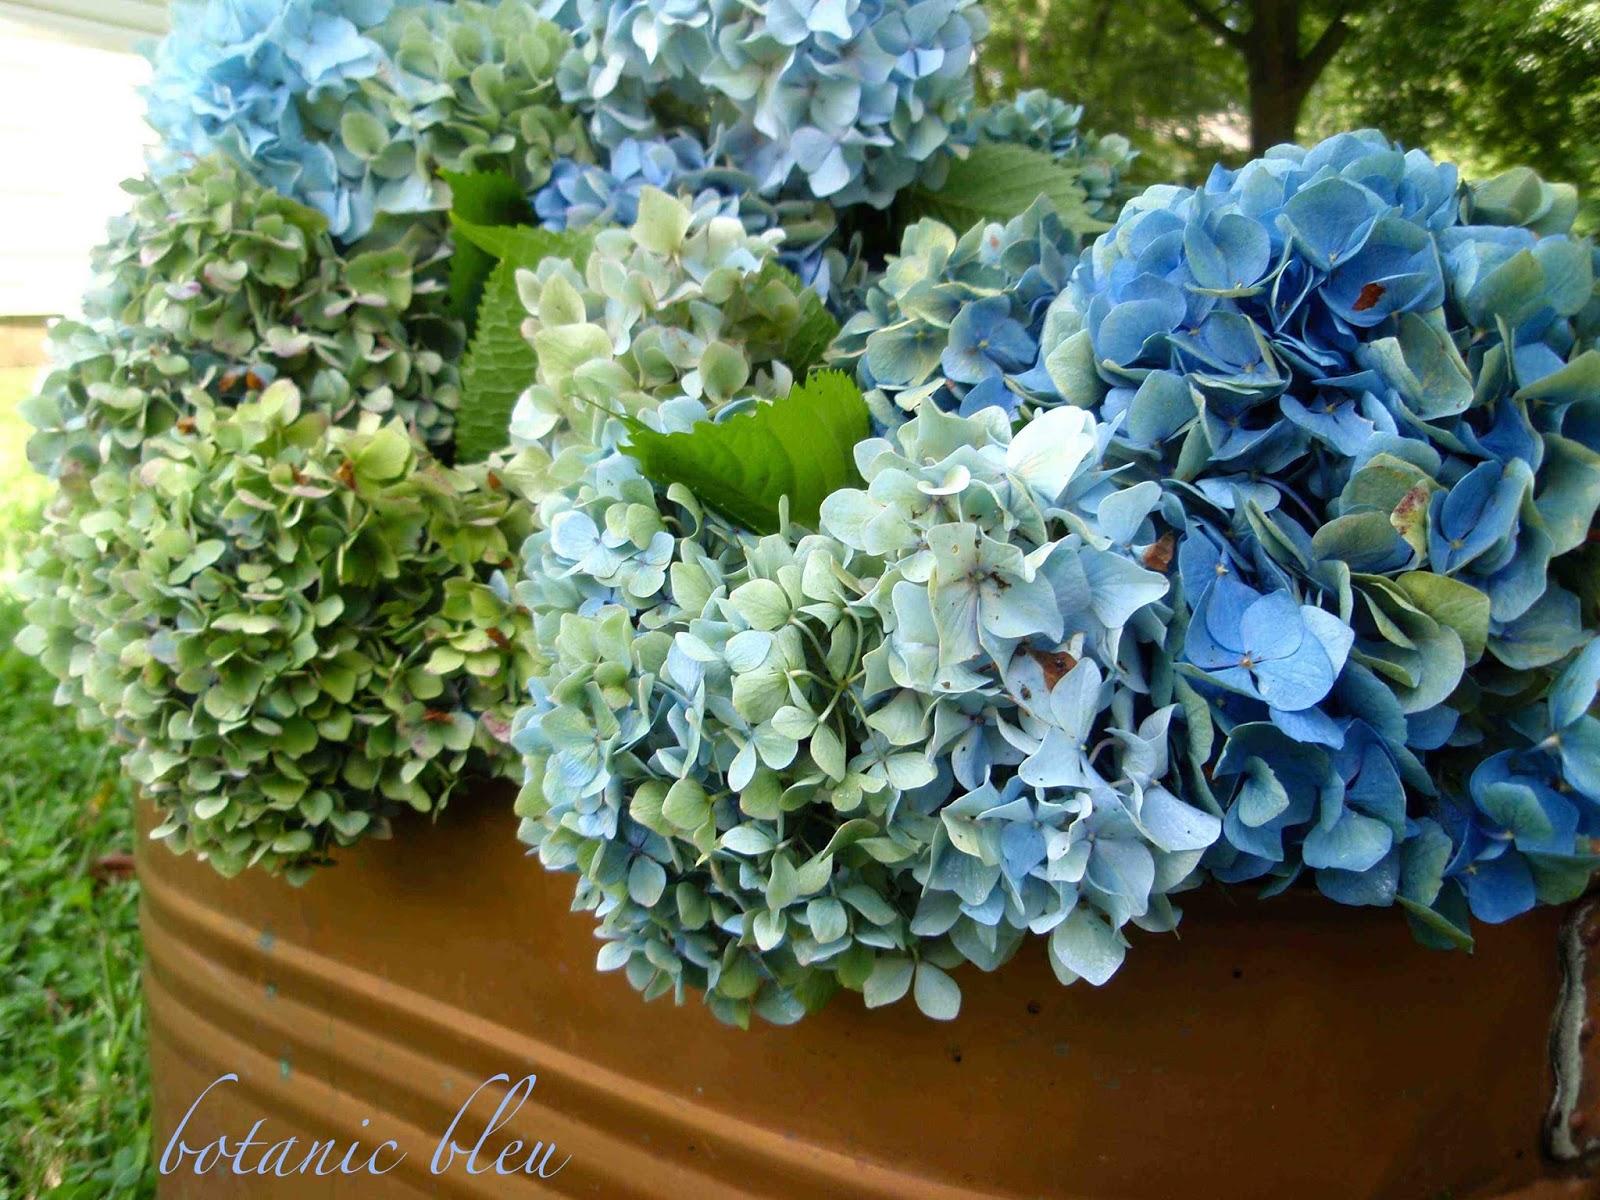 Botanic Bleu Hydrangeas Filled Copper Pot